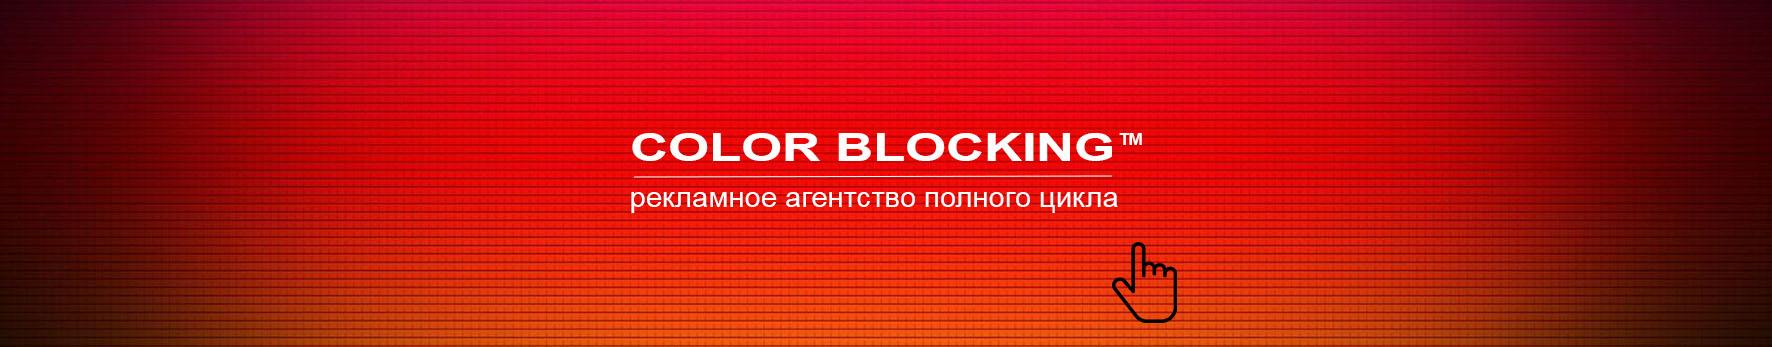 Реклама в Чечне агентство